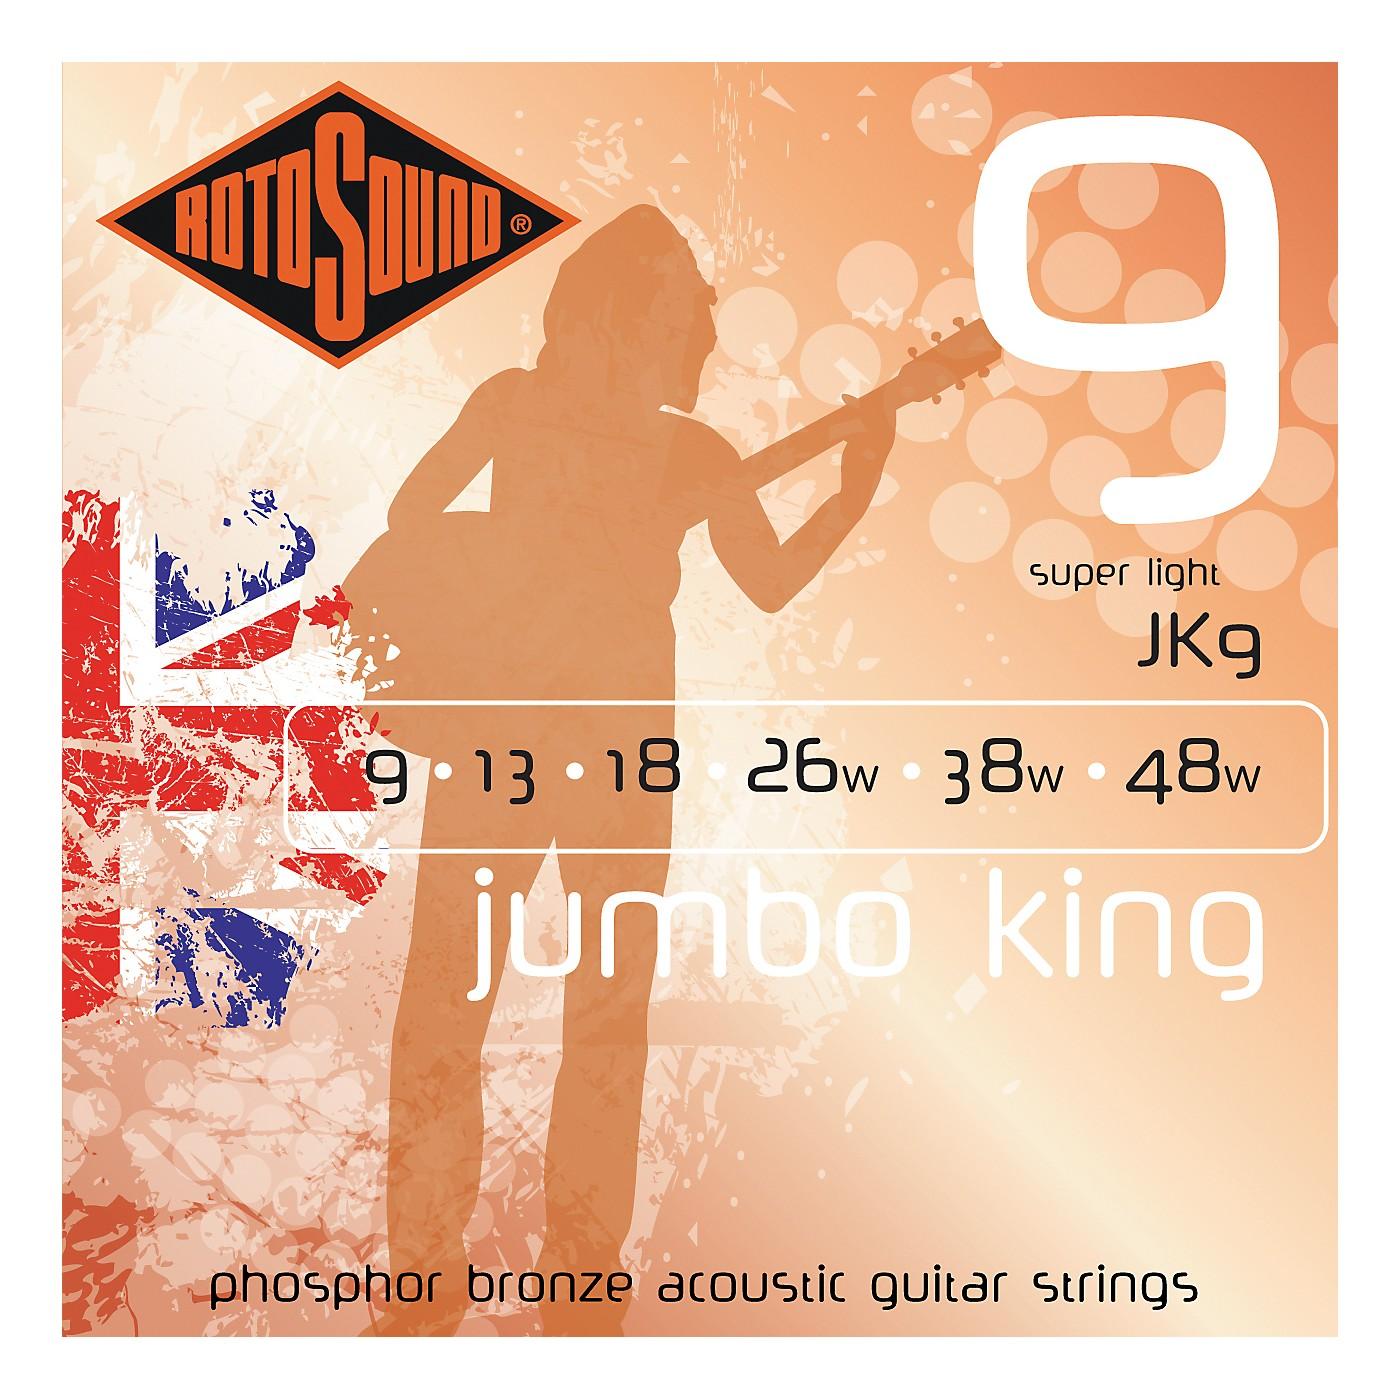 Rotosound Jumbo King Super Light Phosphor Bronze Acoustic Guitar Strings thumbnail